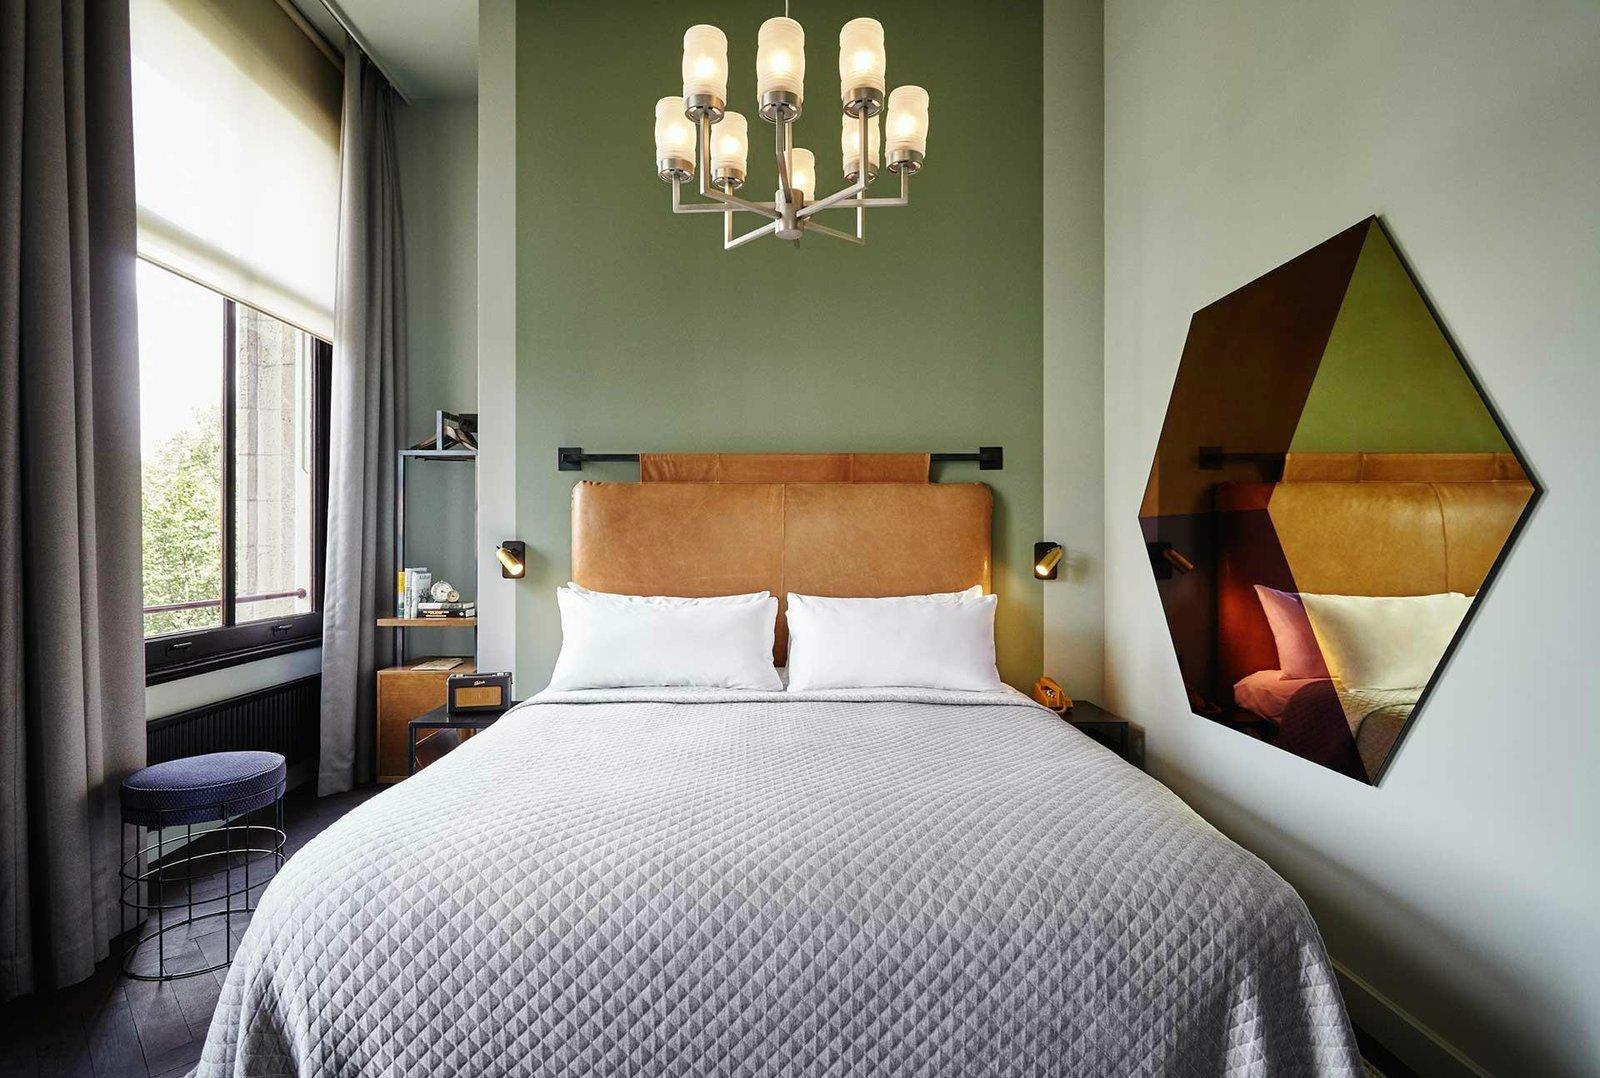 Bedroom, Night Stands, Dark Hardwood Floor, Wall Lighting, Pendant Lighting, and Bed  The Hoxton Amsterdam